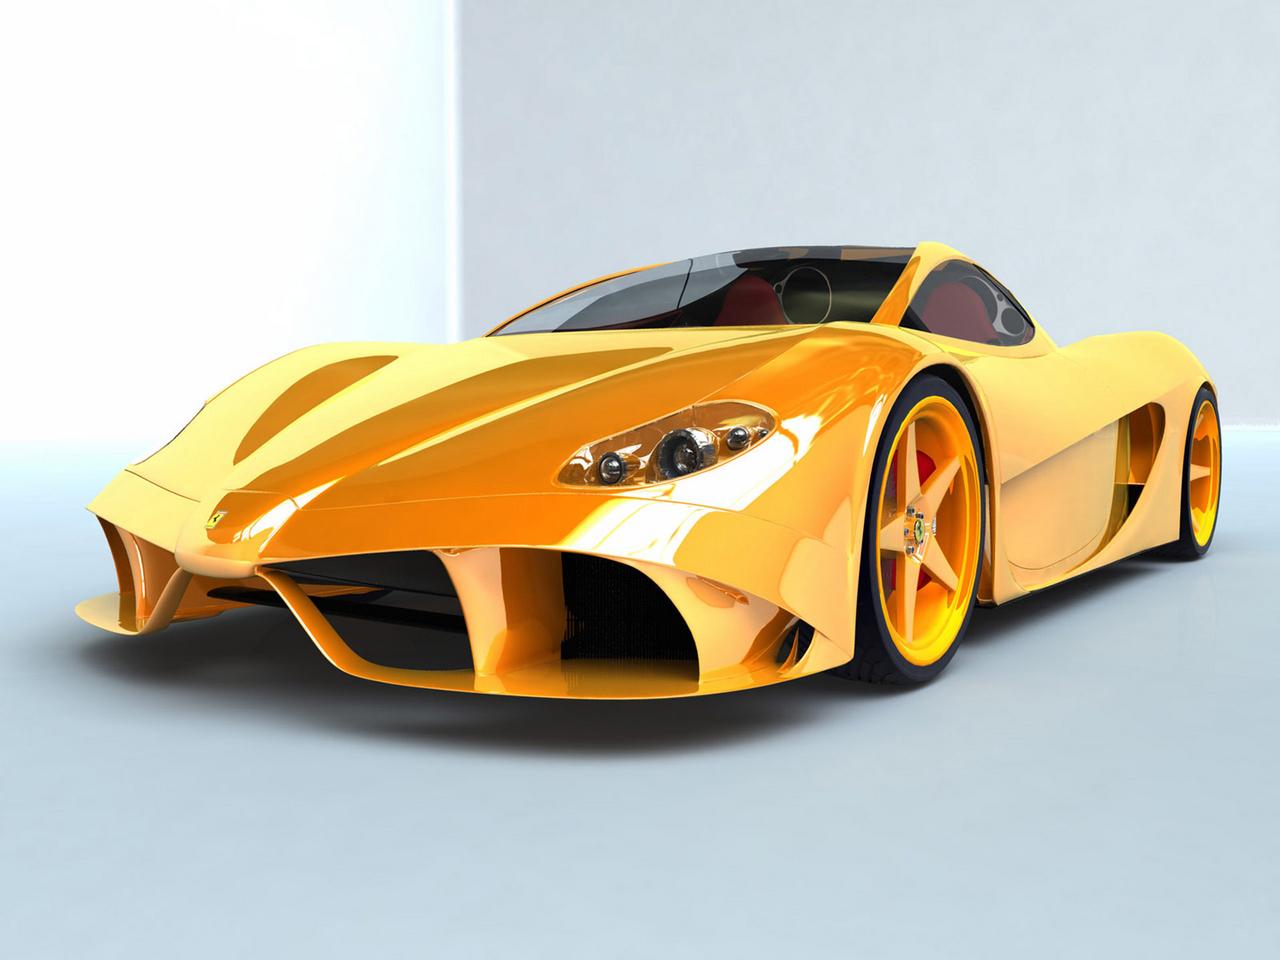 cars exotic supercars wallpaper - photo #5